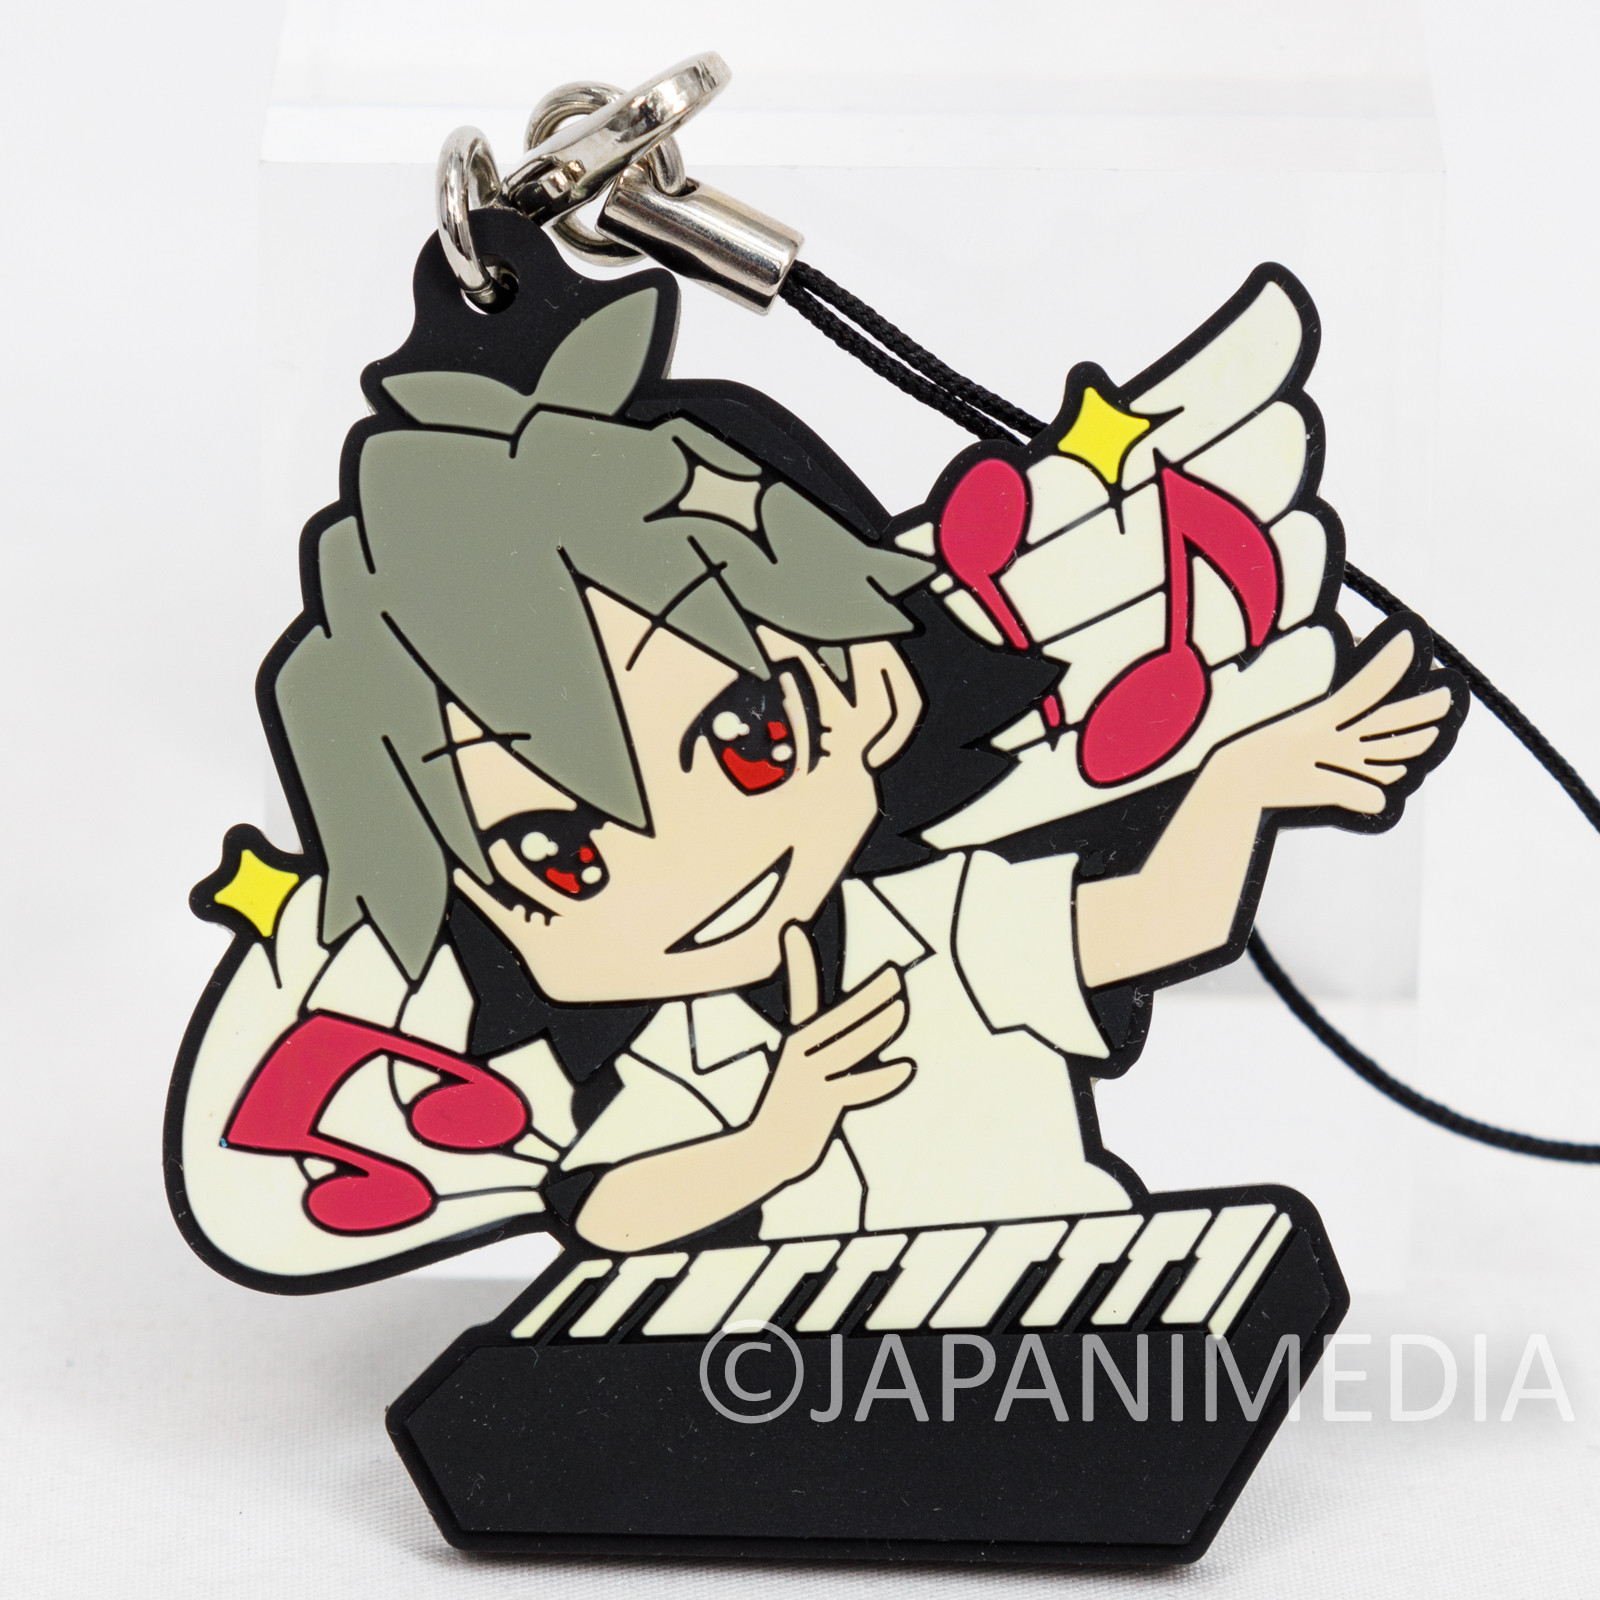 (DAMAGED) Evangelion Petit EVA Nagisa Kaworu Rubber Strap Banpresto JAPAN ANIME MANGA EVA